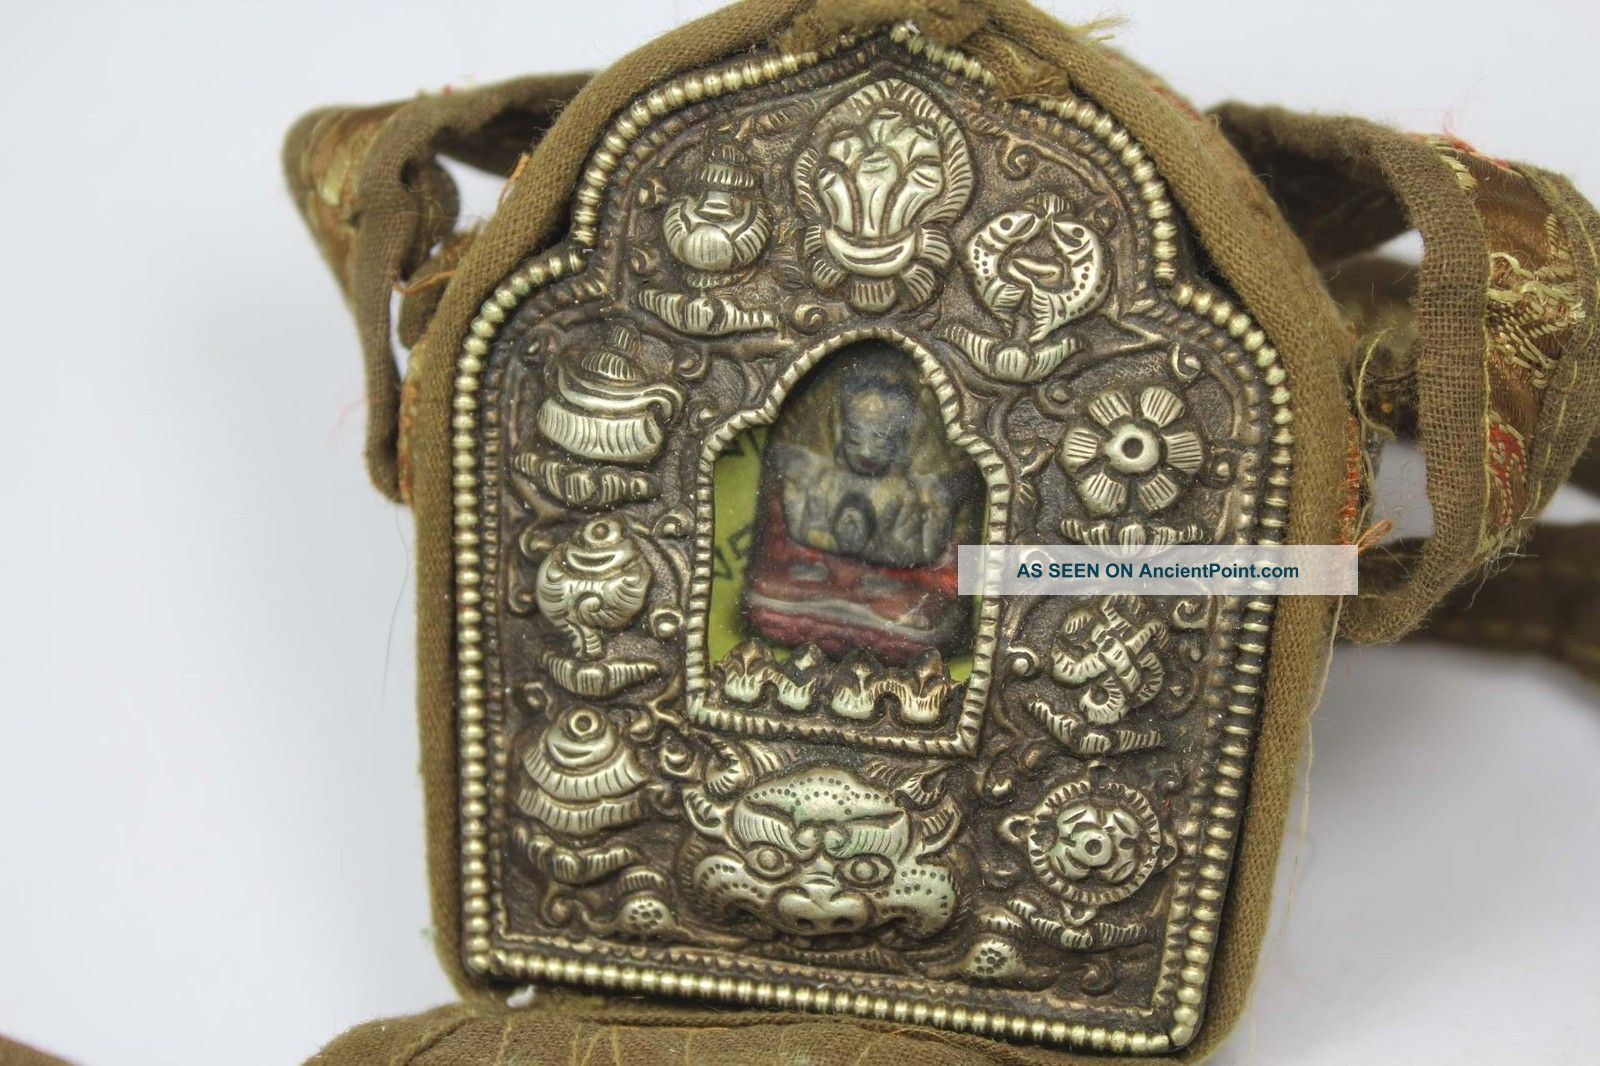 Nepal Tibet Old Copper/ Cloth Wonderful Handwork Buddha Box Pendant Buddha photo